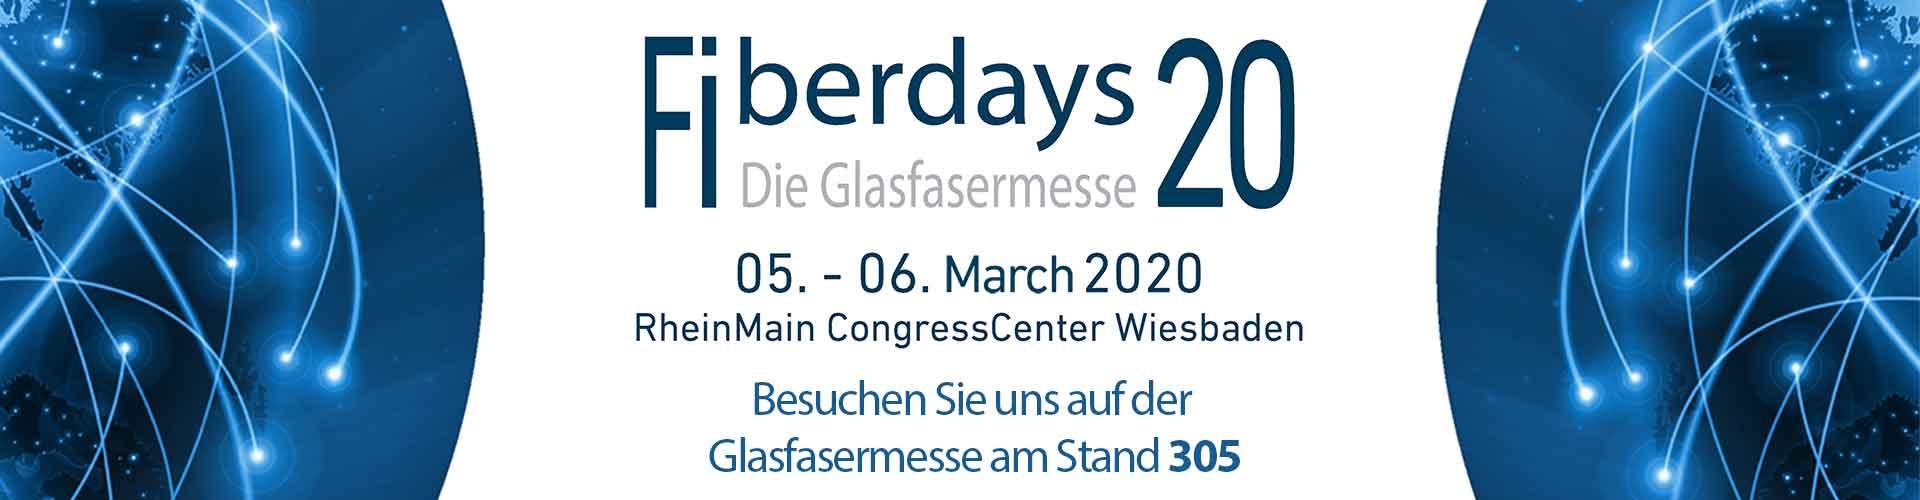 Fiberdays 2020 Stand 305